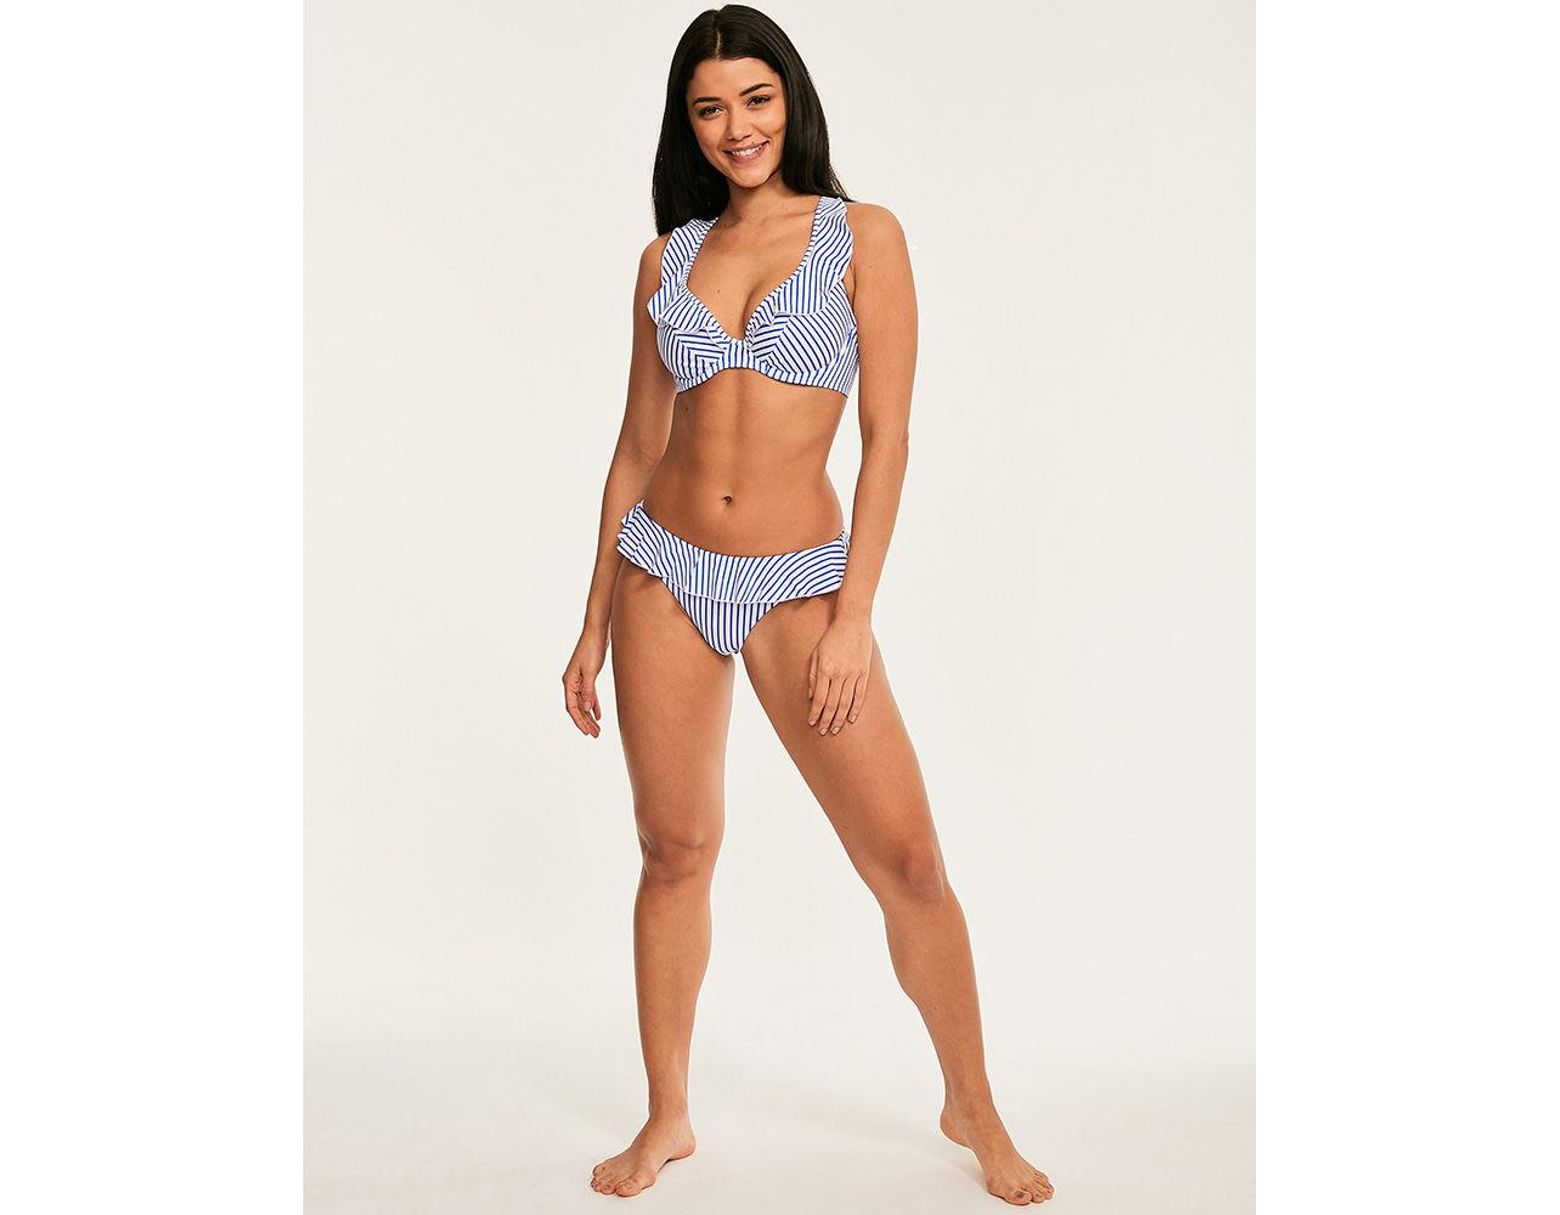 b897f67a0f Freya Totally Stripe Underwired Non Padded High Apex Bikini Top in Blue -  Lyst